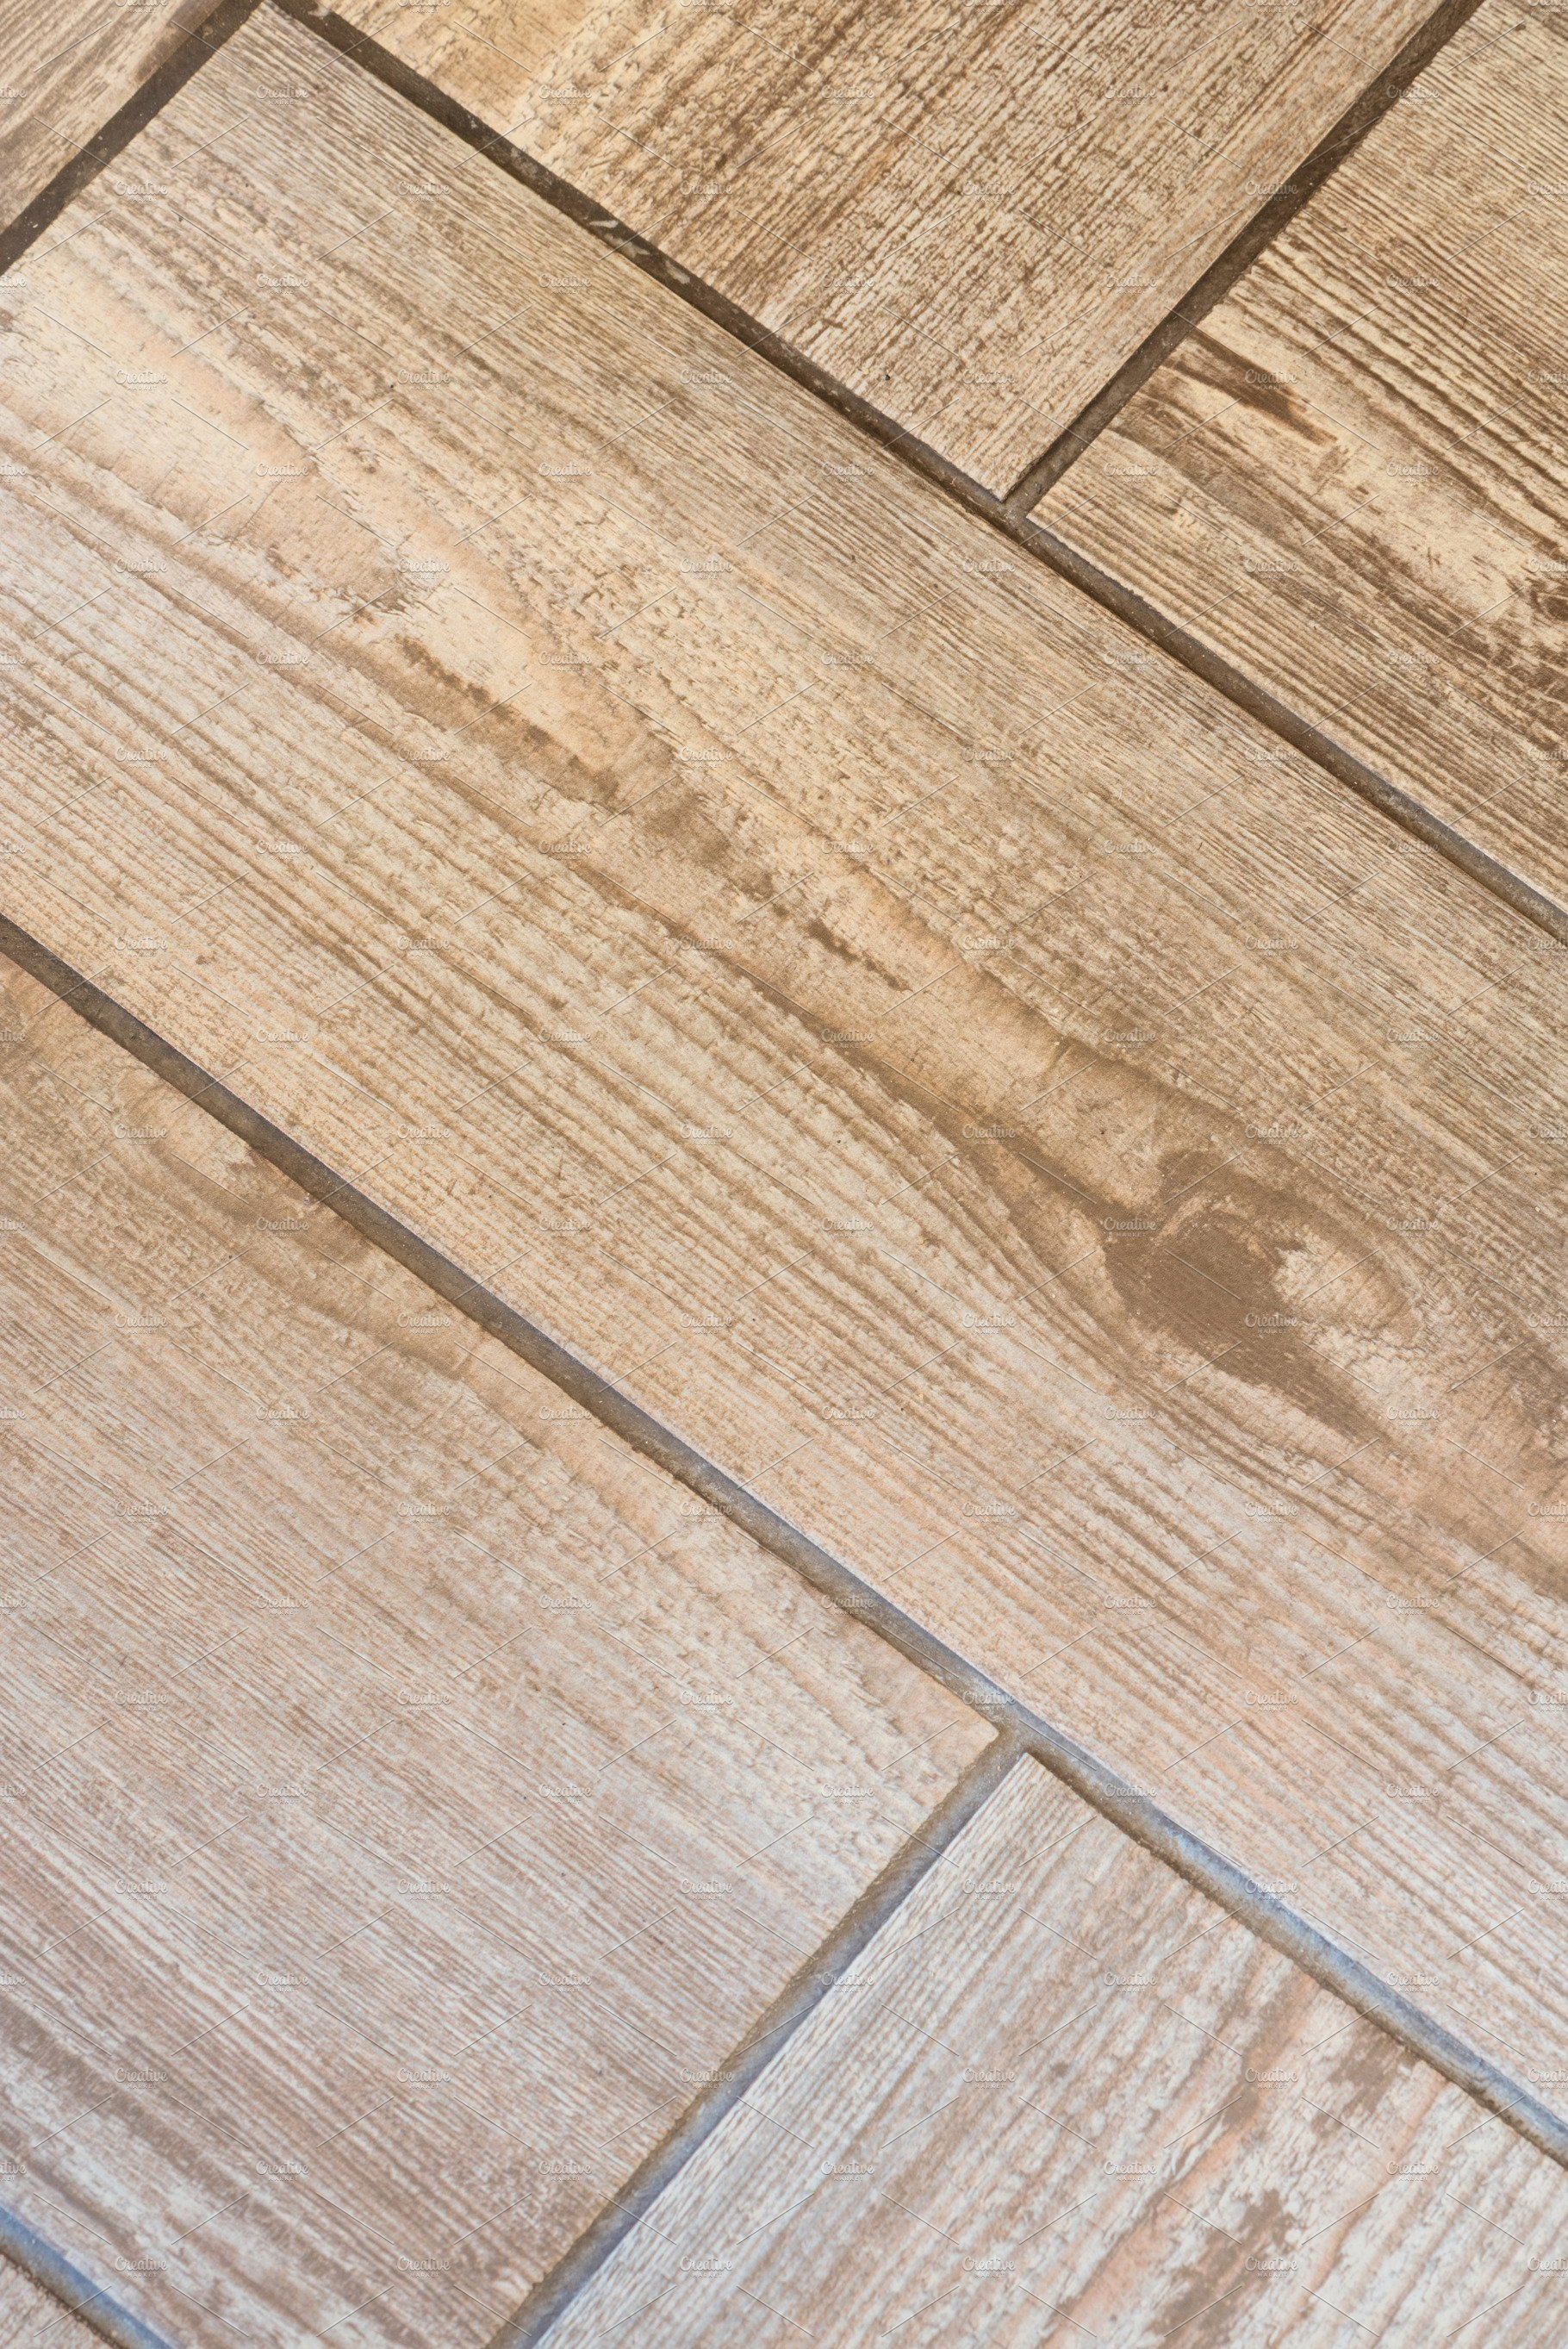 Wooden Ceramic Tile Texture High